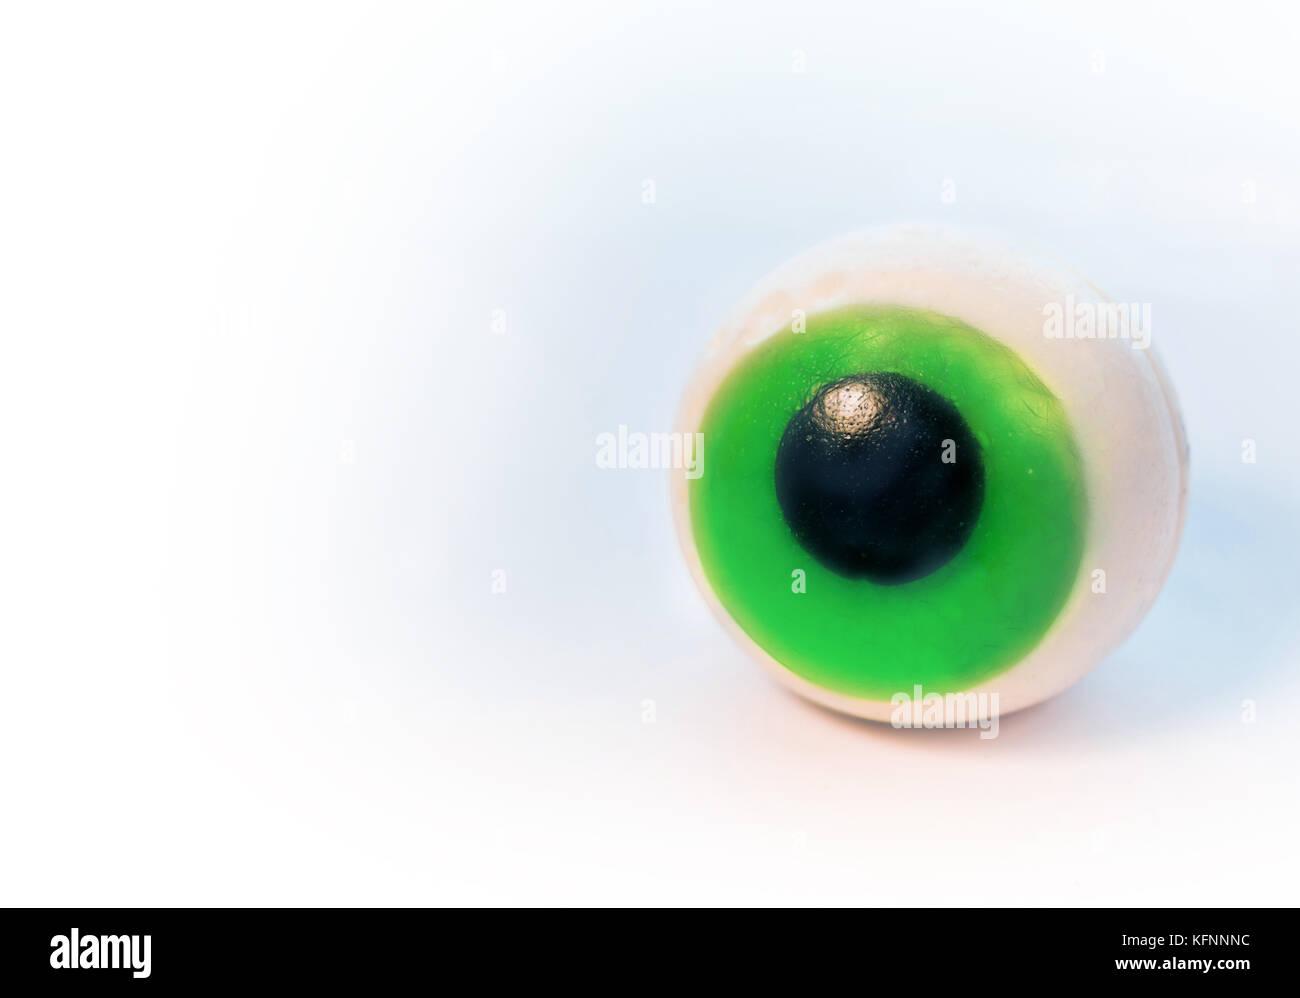 Retina Diagram Stockfotos & Retina Diagram Bilder - Alamy